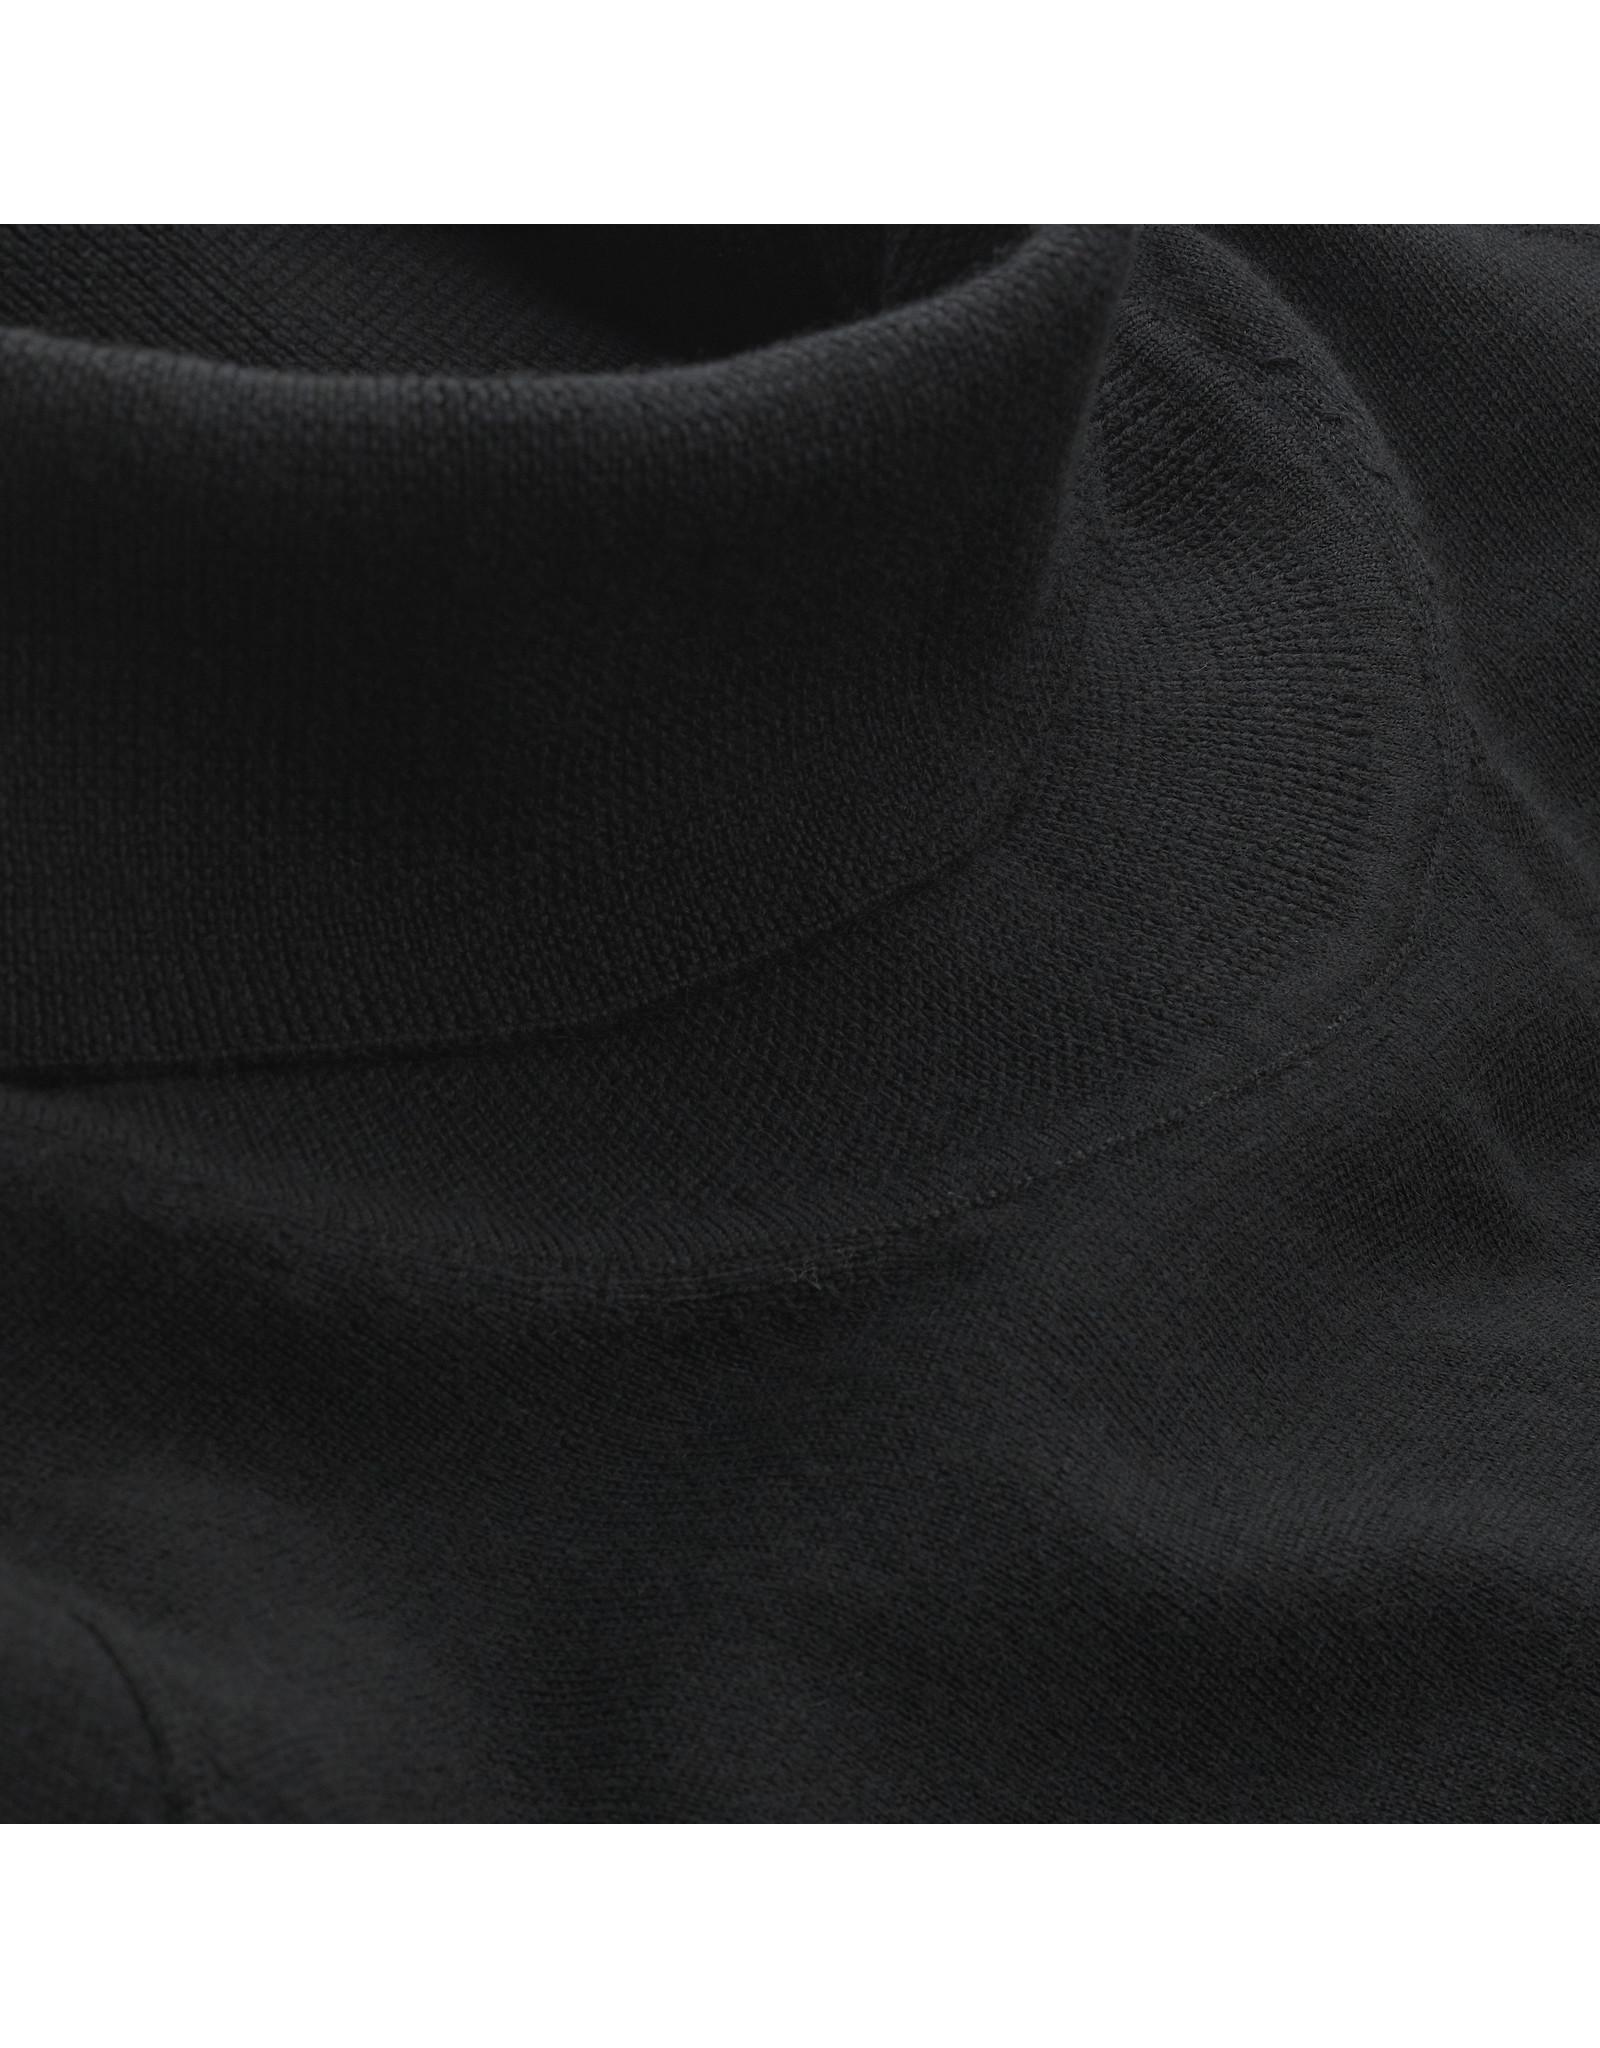 CIRCLE  TURIJN - BLACK